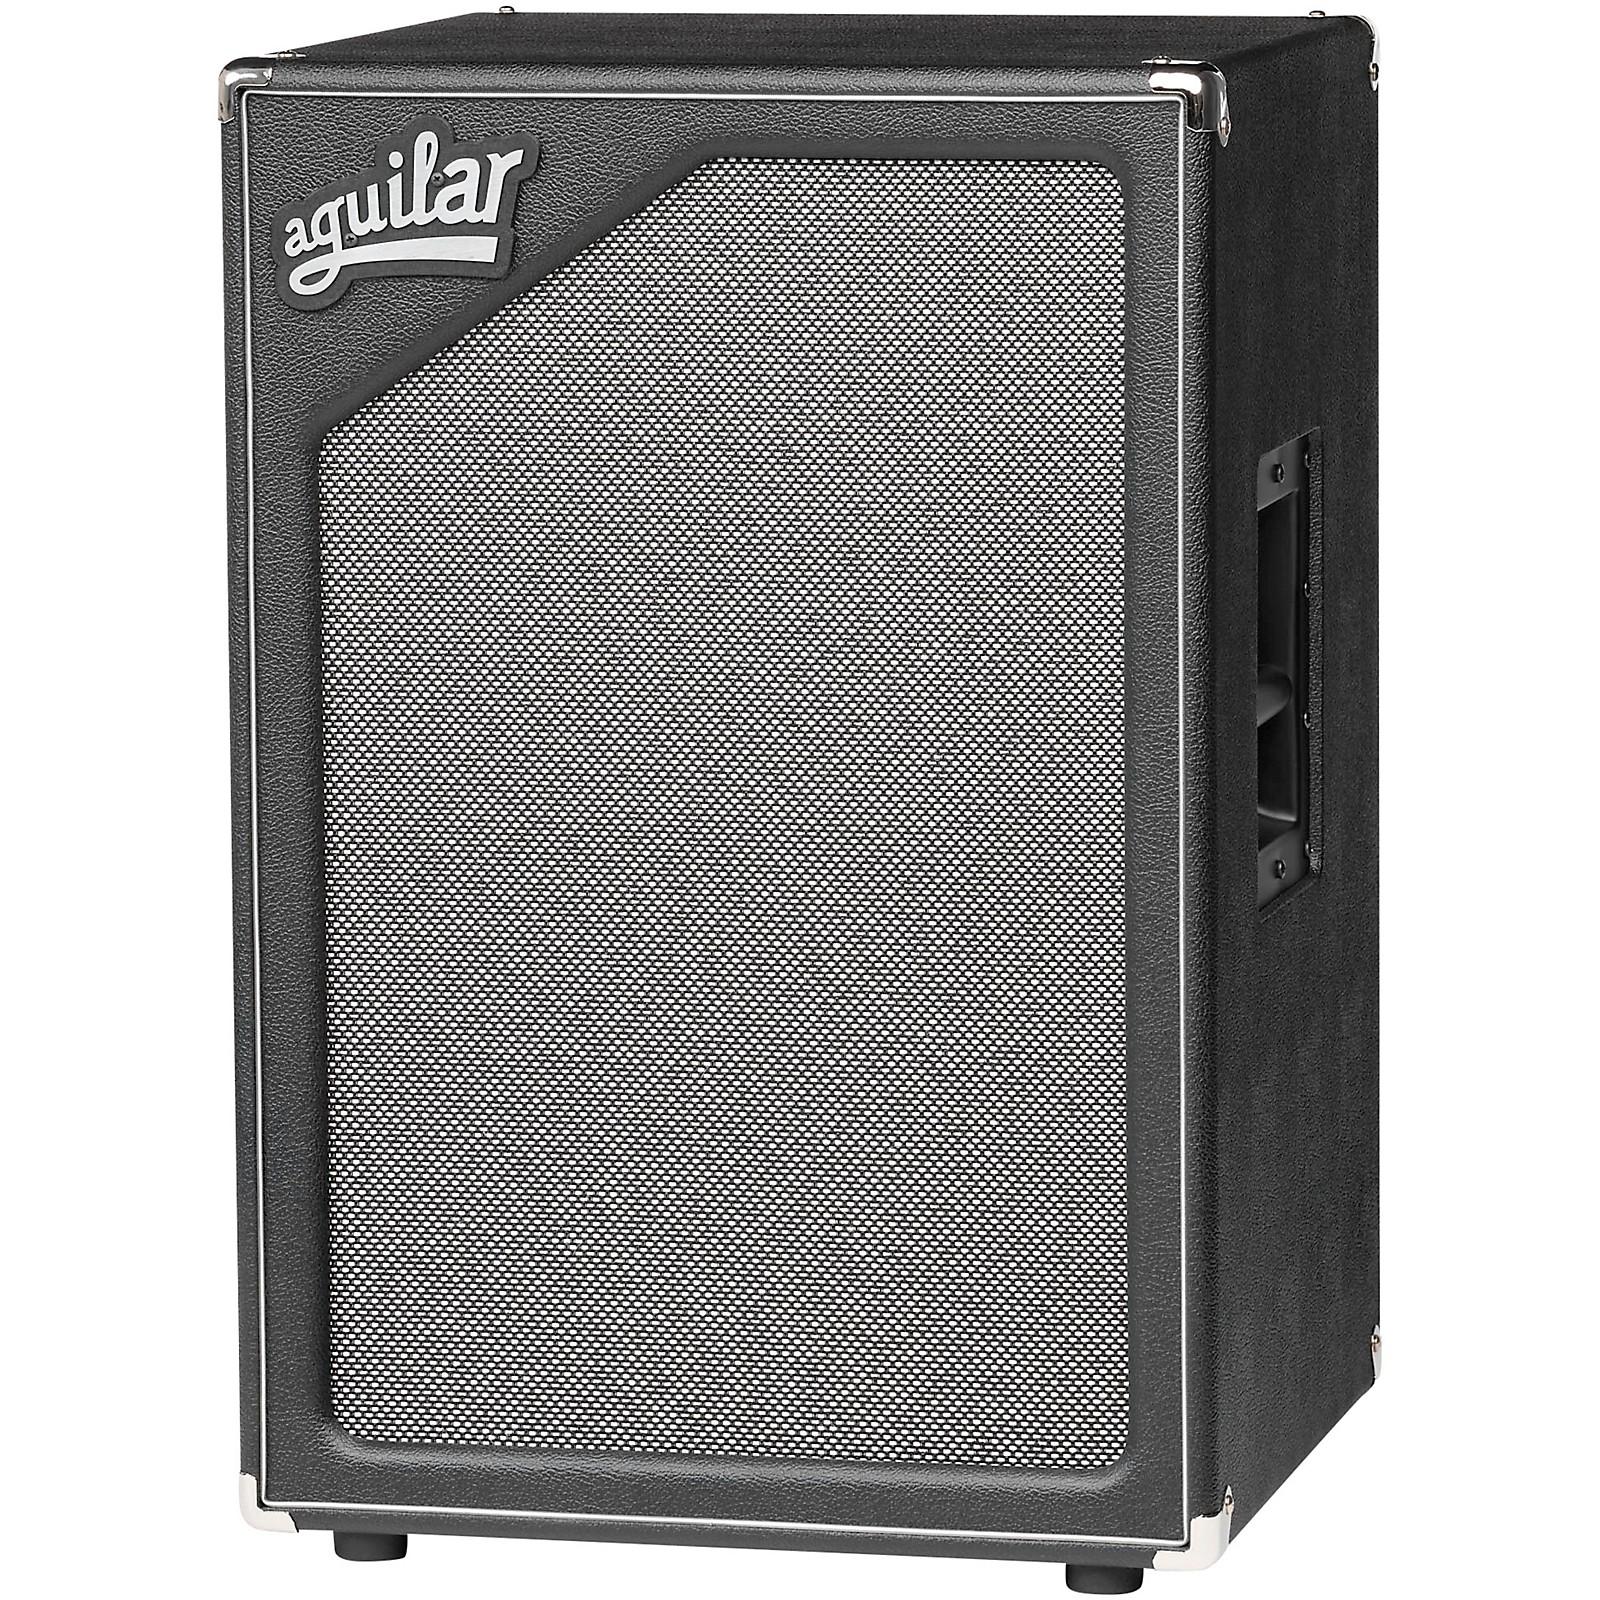 Aguilar SL 212 500W 2x12 Bass Speaker Cabinet